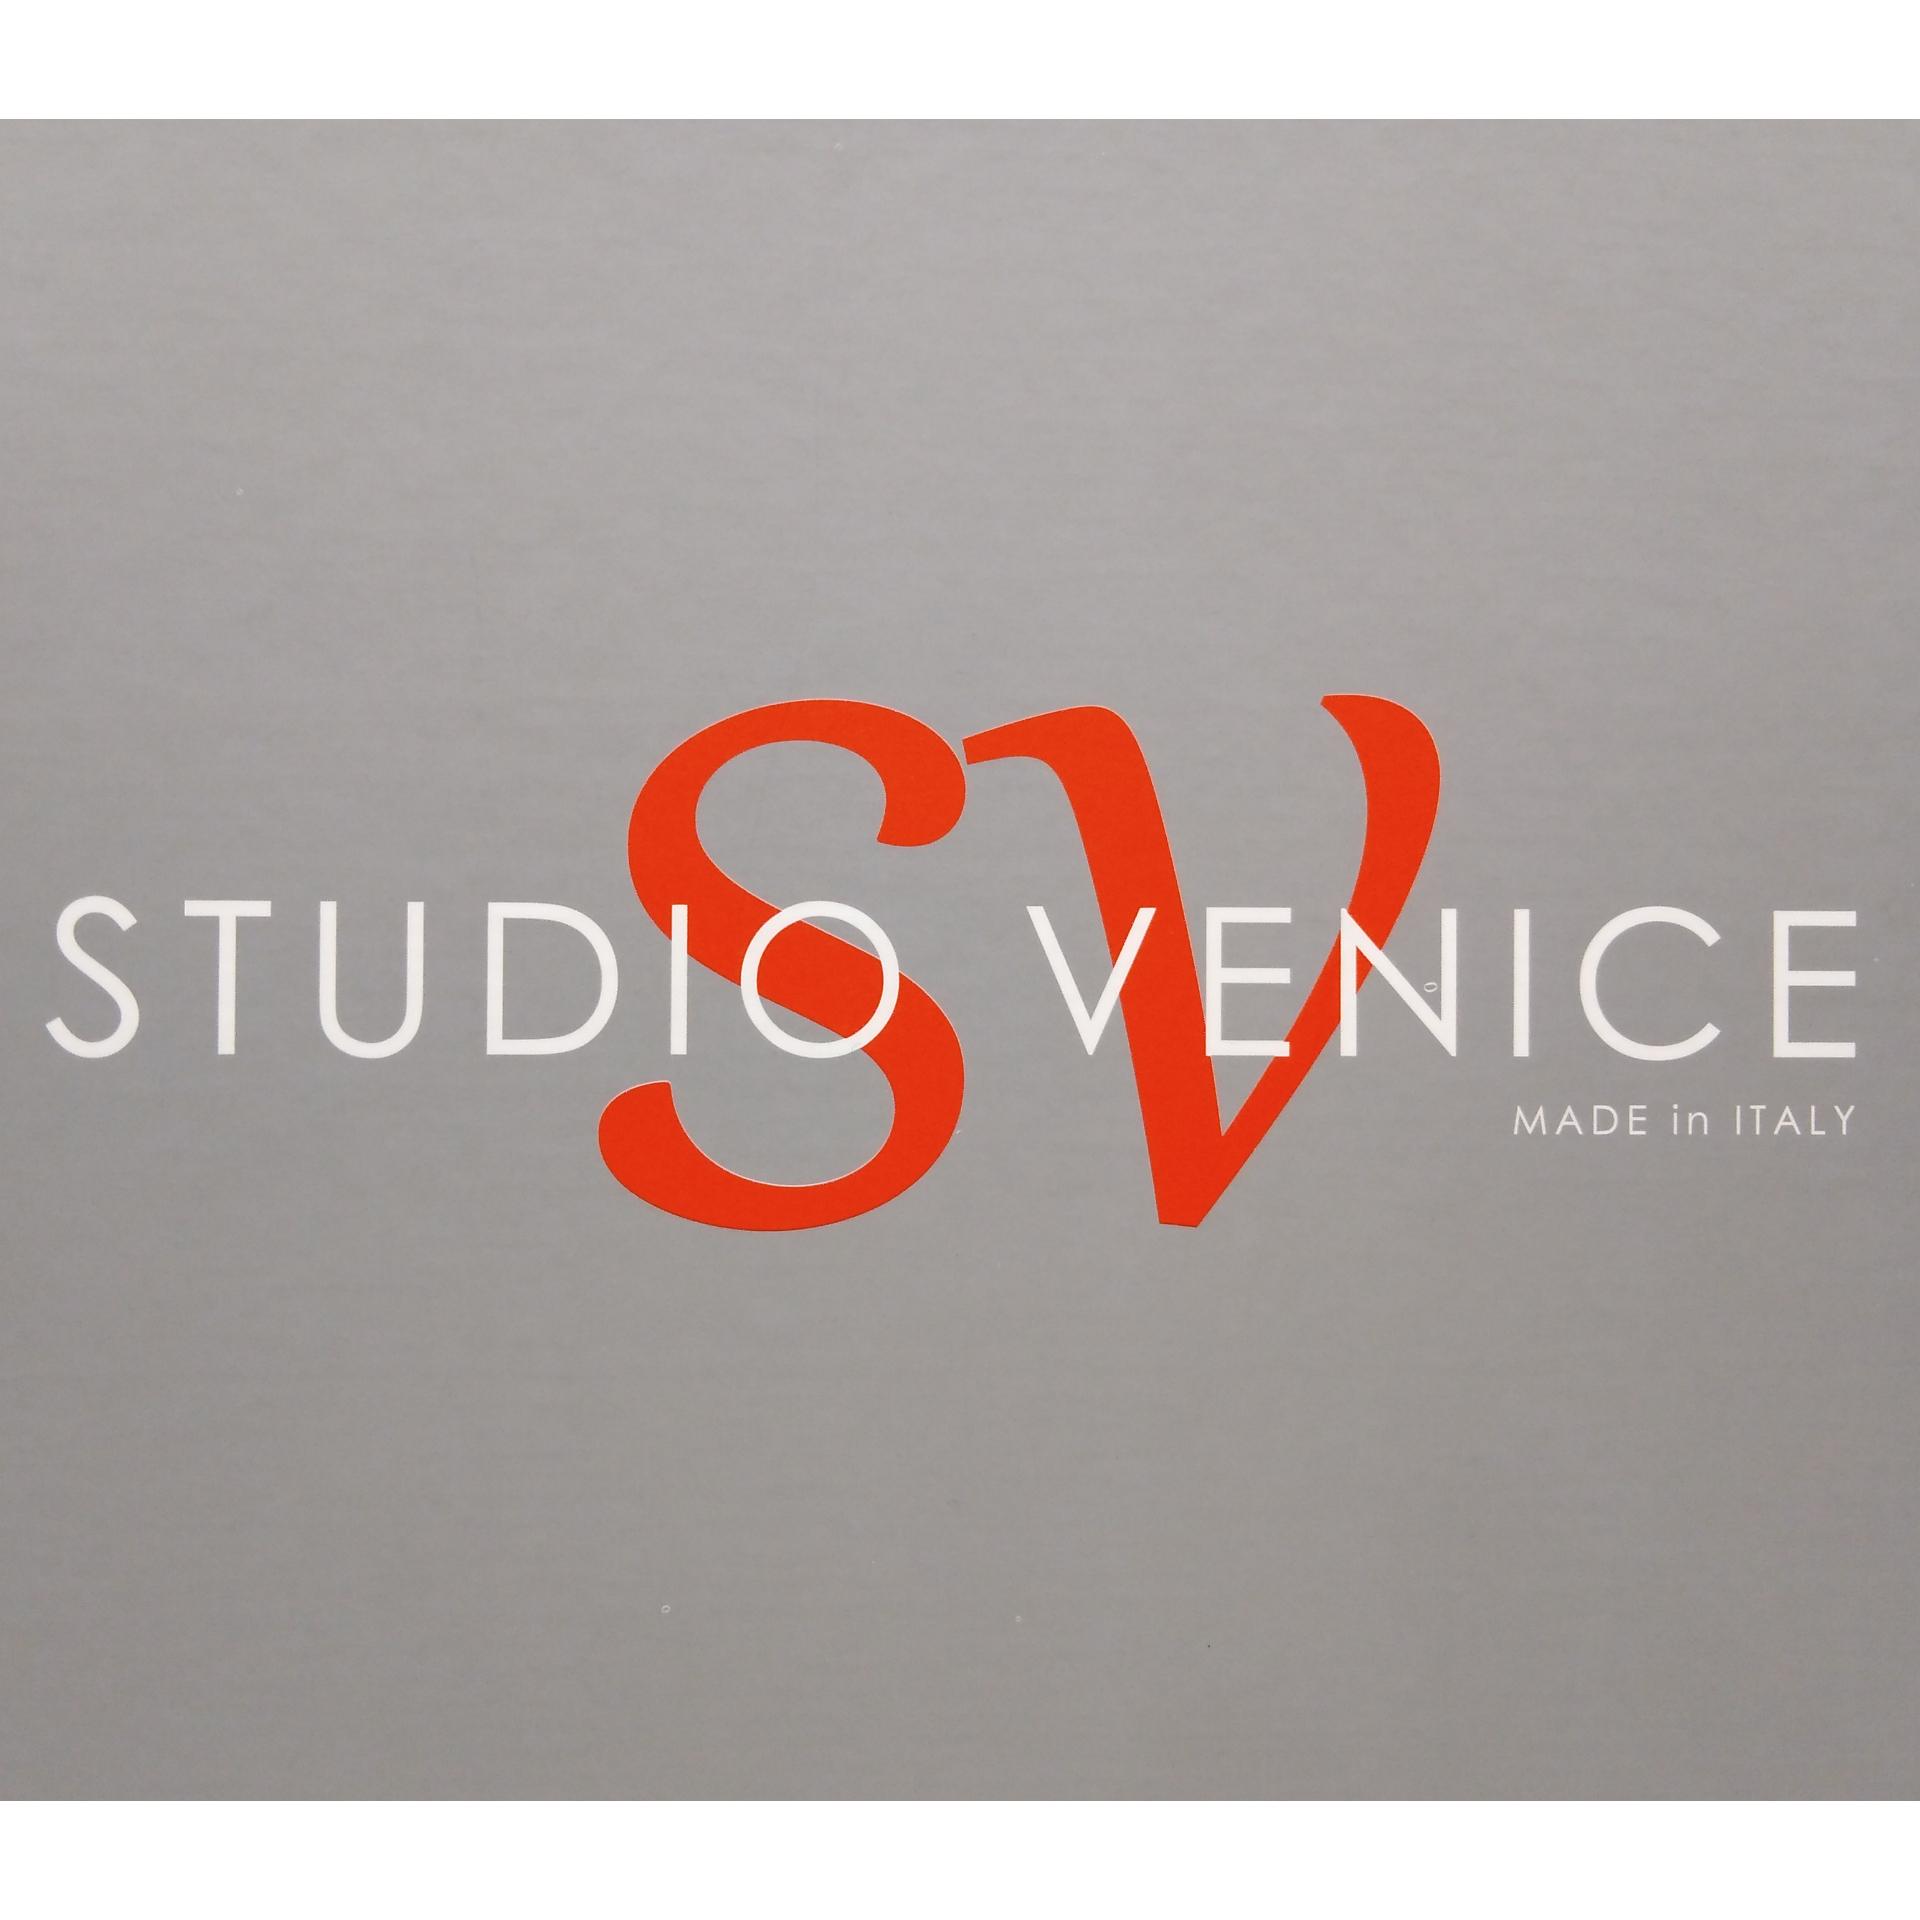 STUDIO VENICE